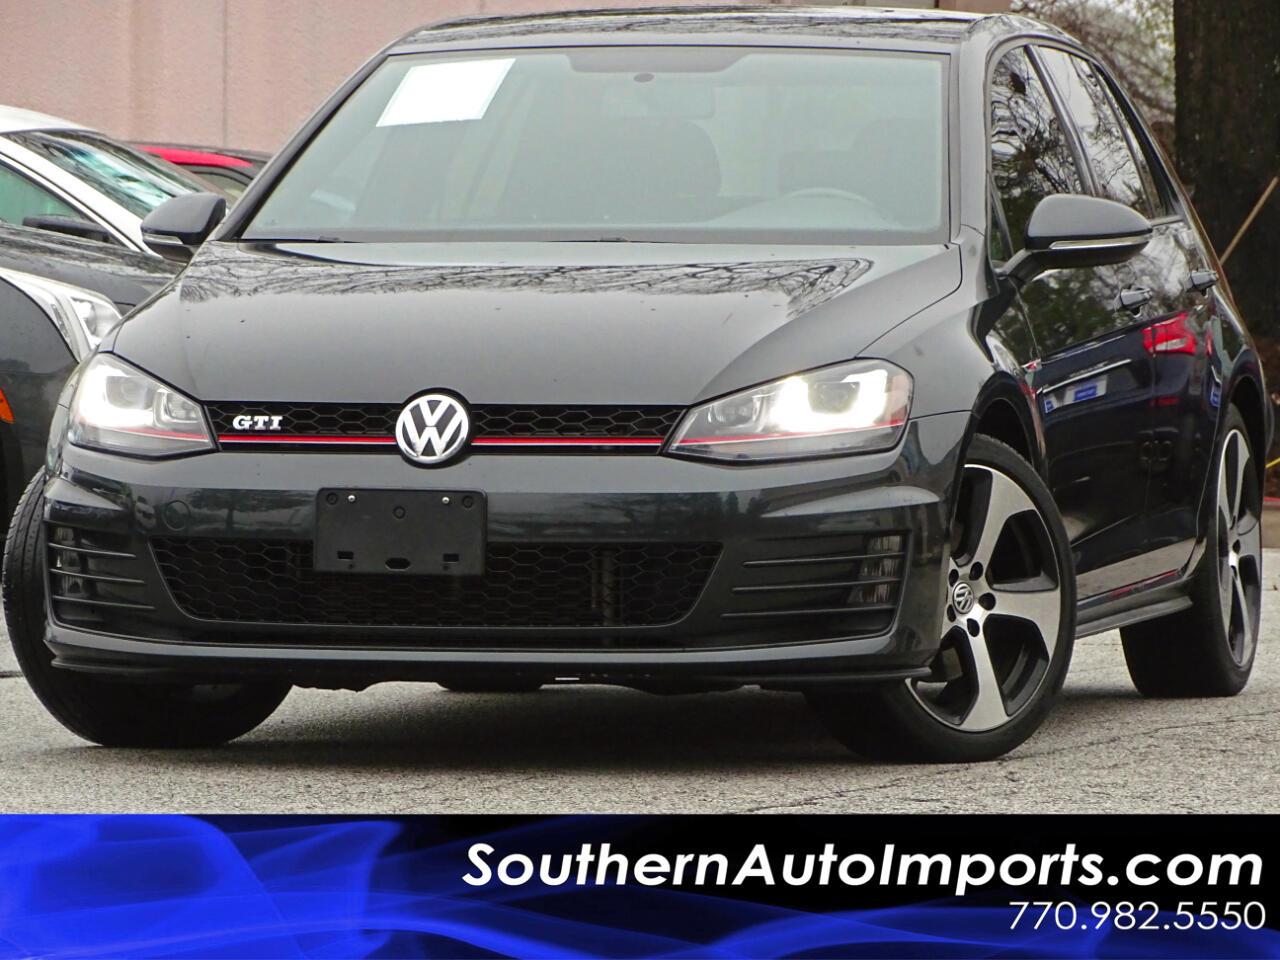 2016 Volkswagen Golf GTI S w/Lighting Package Back Up Camera 1owner